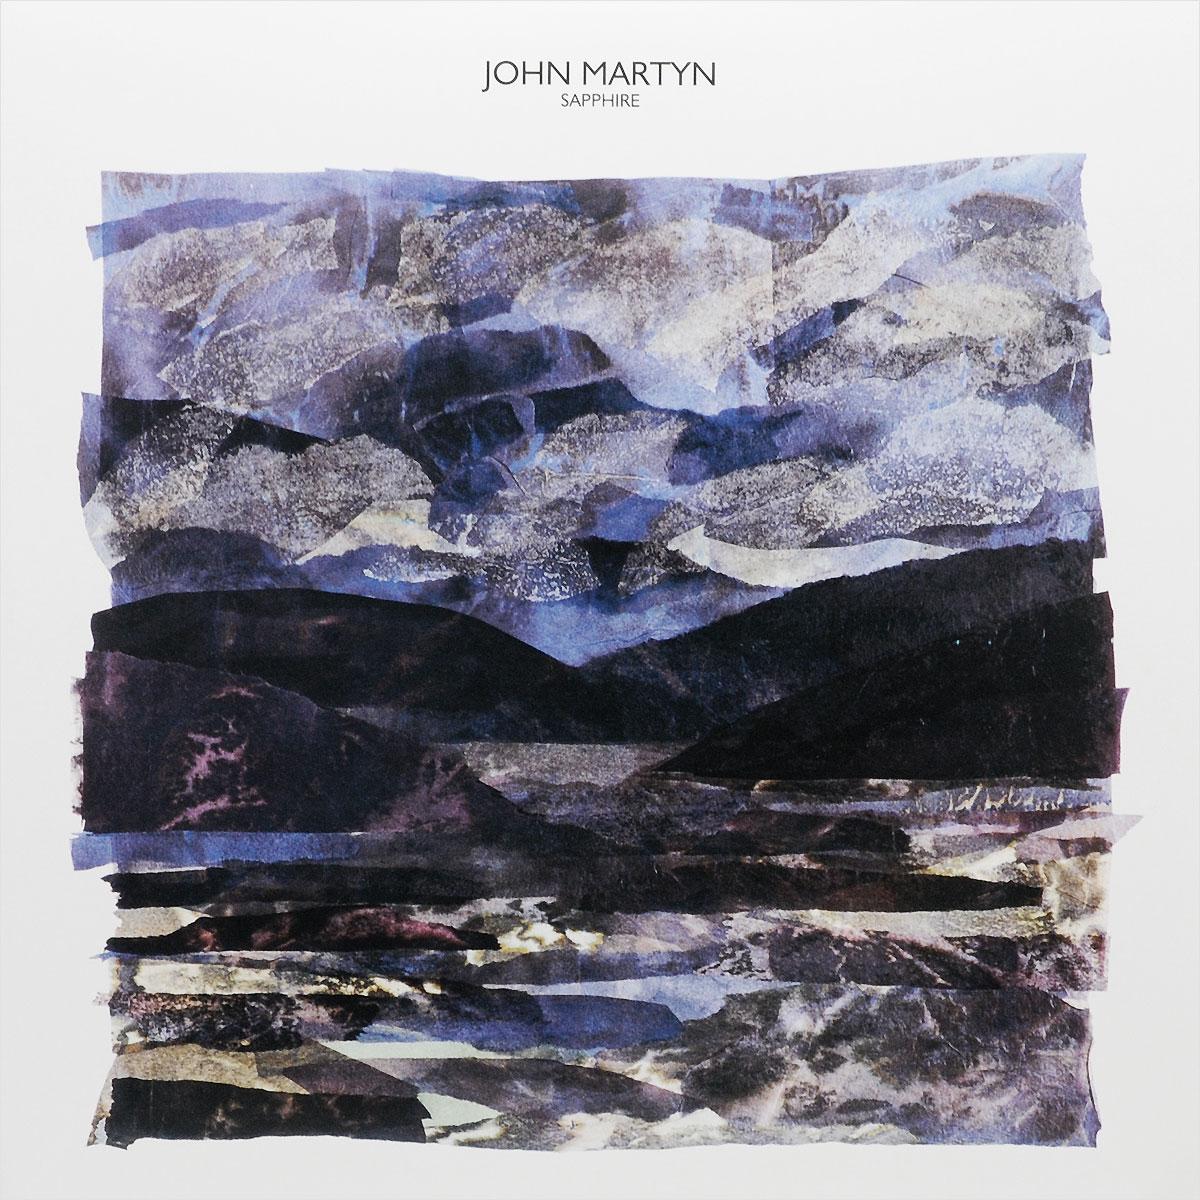 Джон Мартин John Martyn. Sapphire (2 LP) джон мартин john martyn sapphire 2 lp